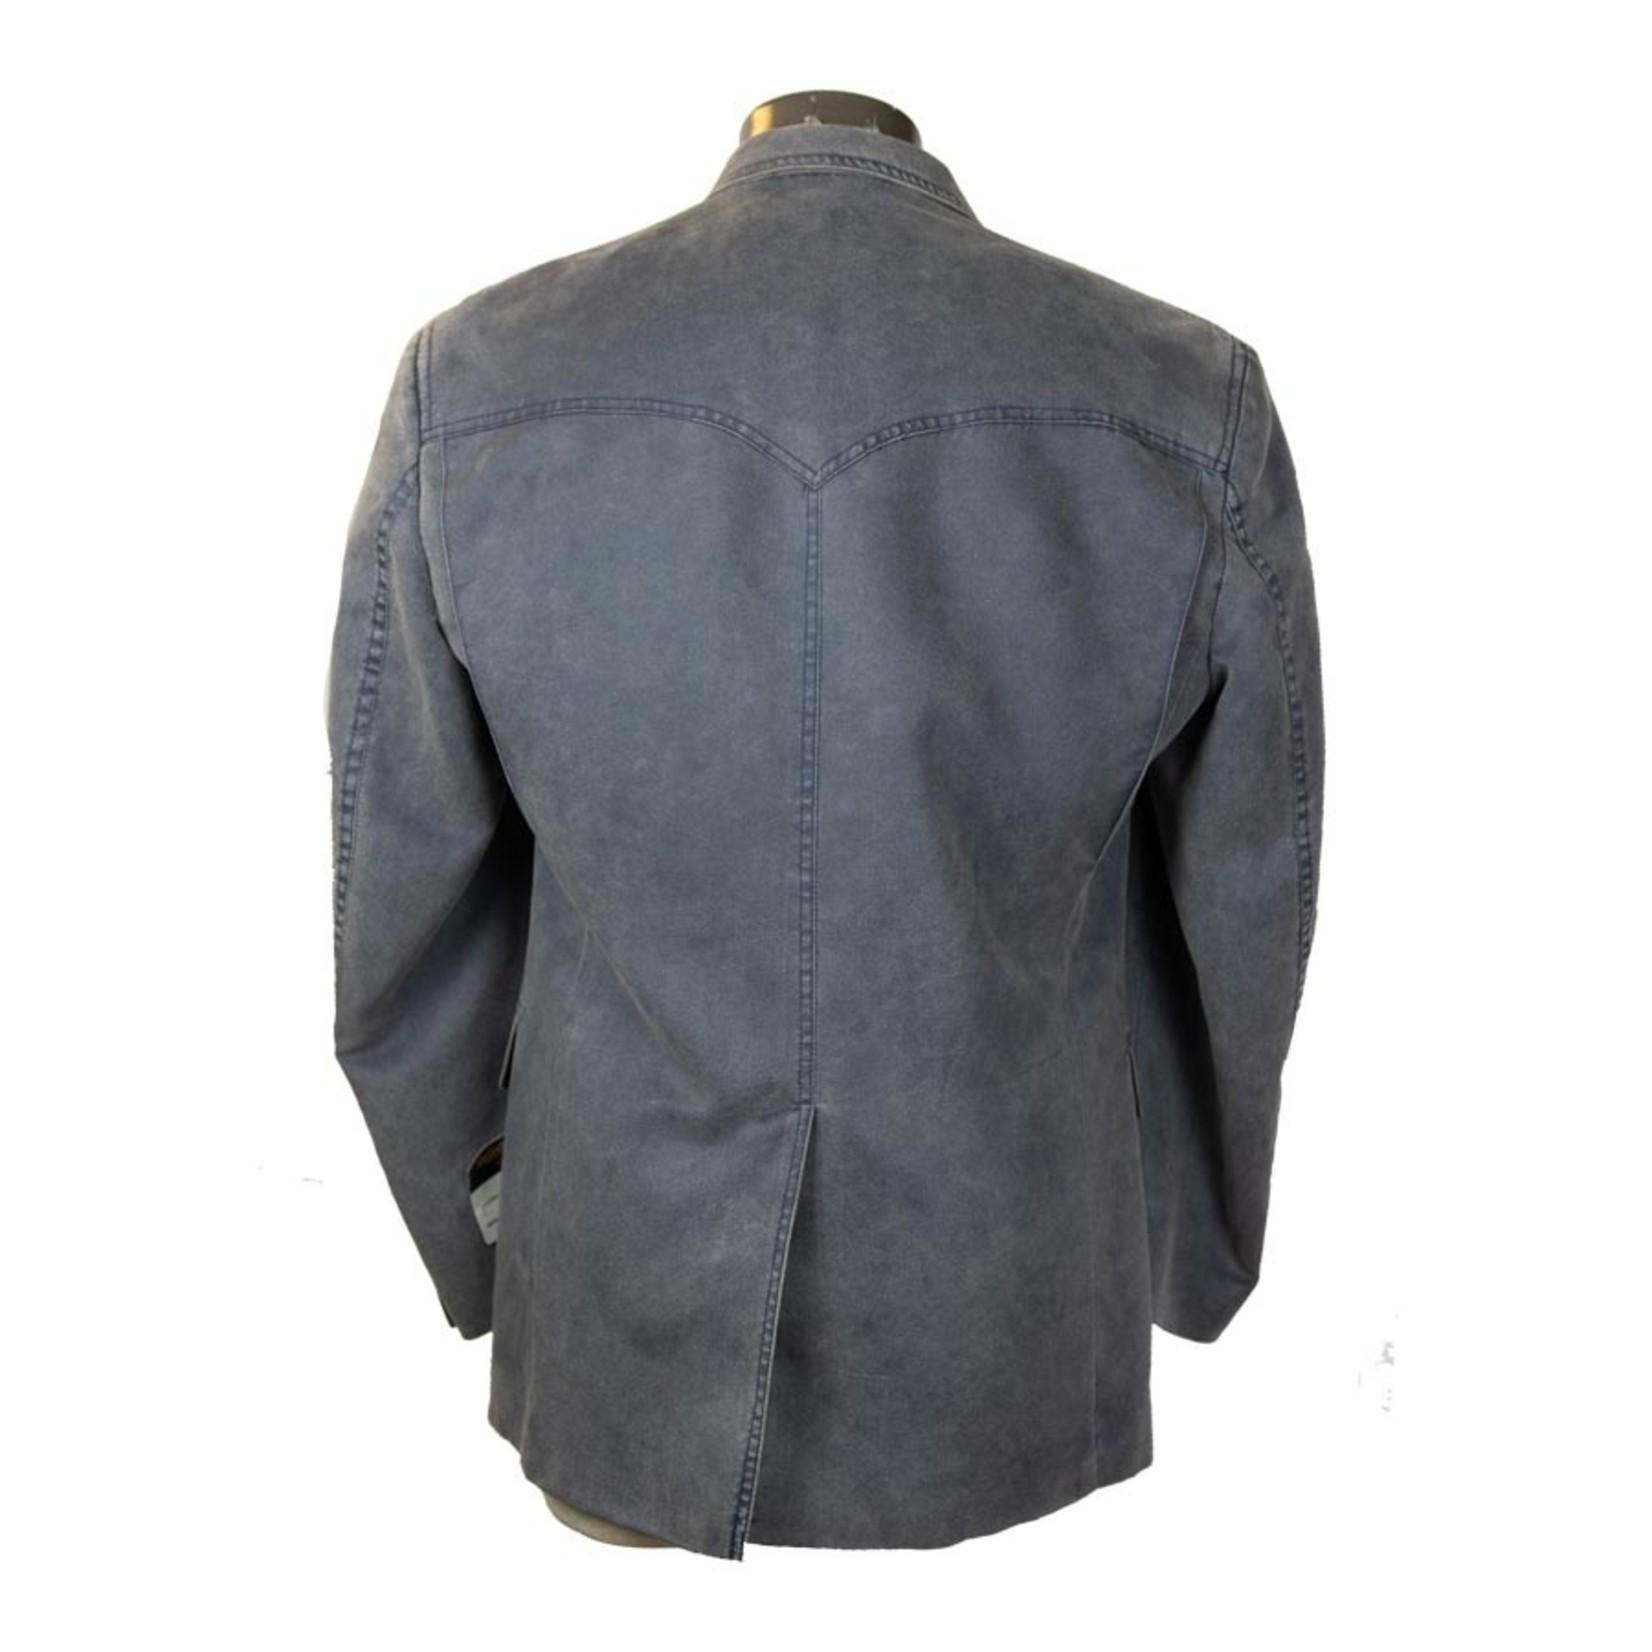 Dallas 100% Polyester Vintage Suit Jacket - Size 40 - #31